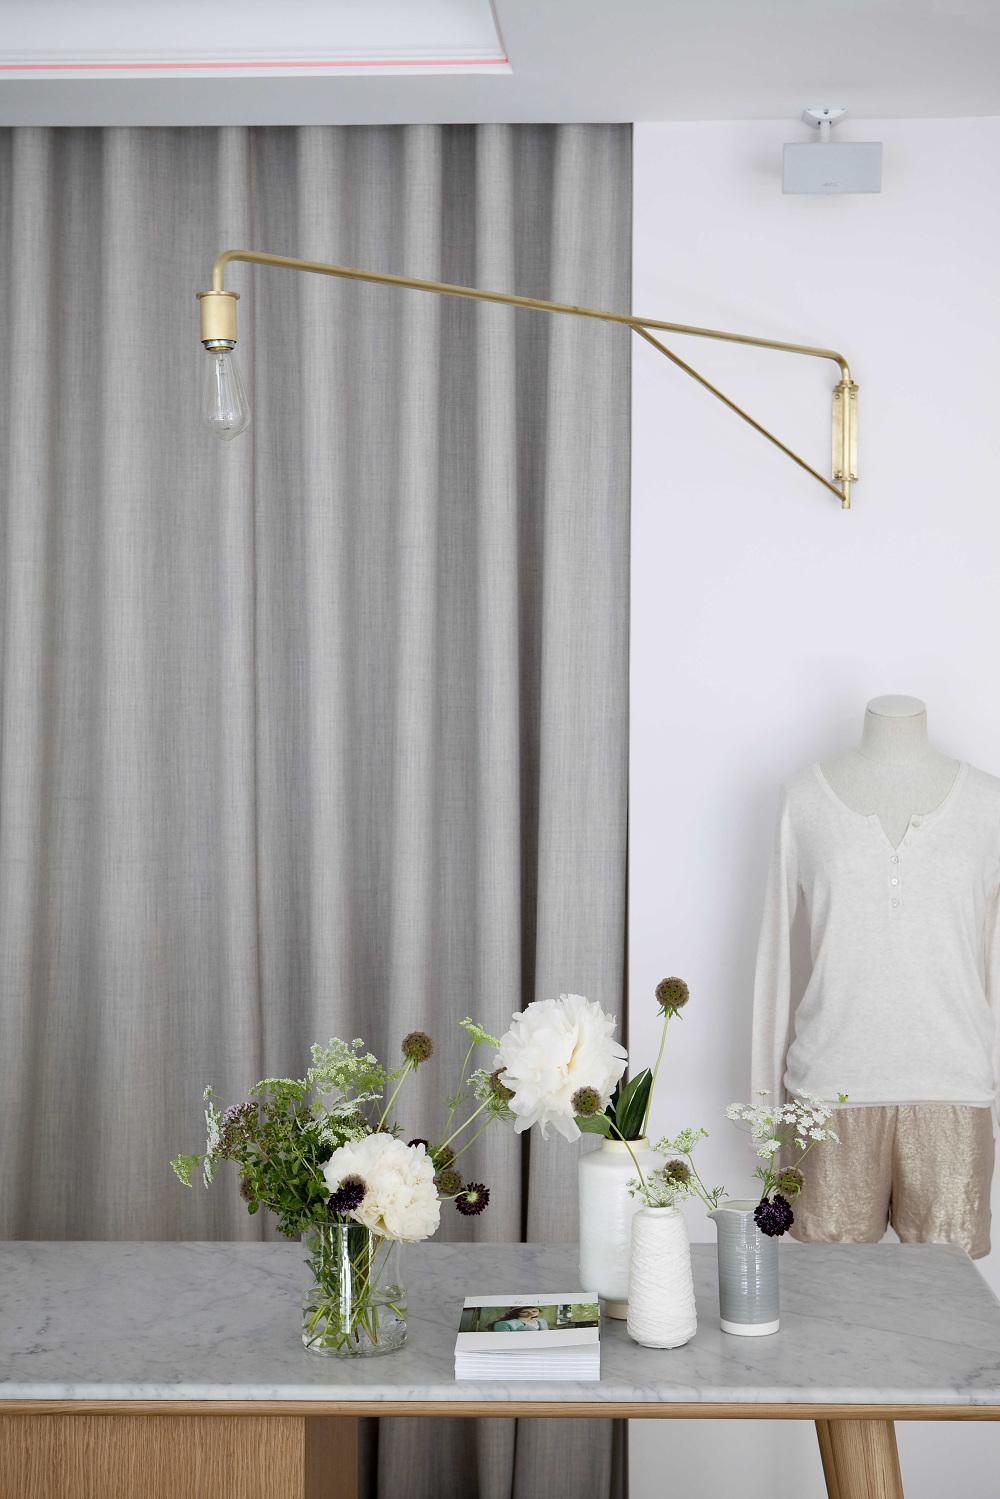 marie sixtine sandrineplace. Black Bedroom Furniture Sets. Home Design Ideas